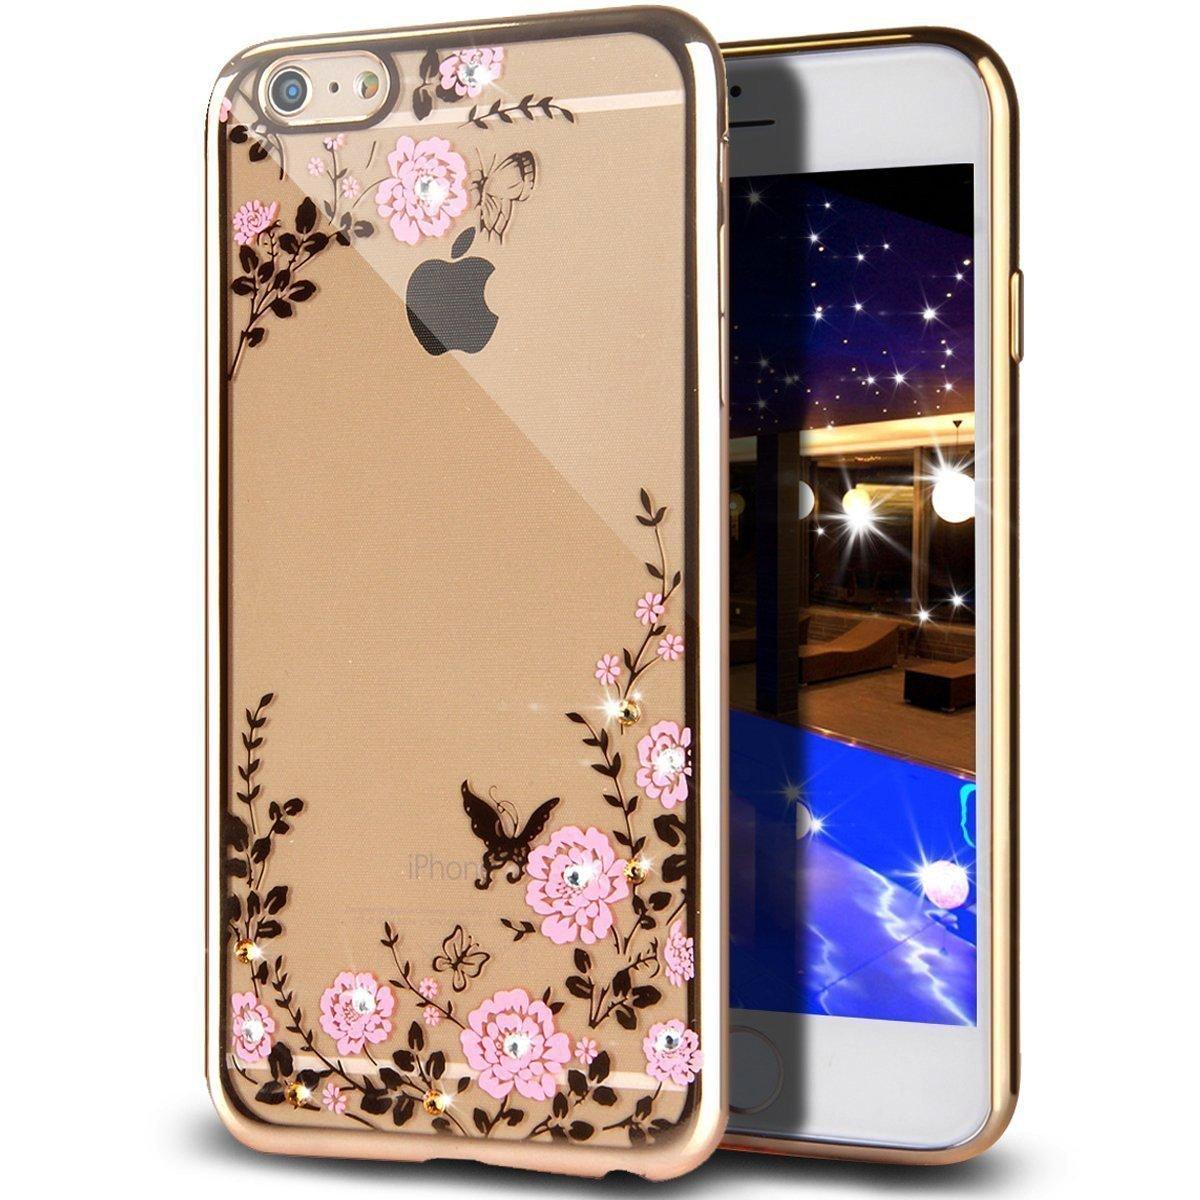 Obal / kryt Crystal Flowers pro iPhone 6s / 6 Plus (gold)